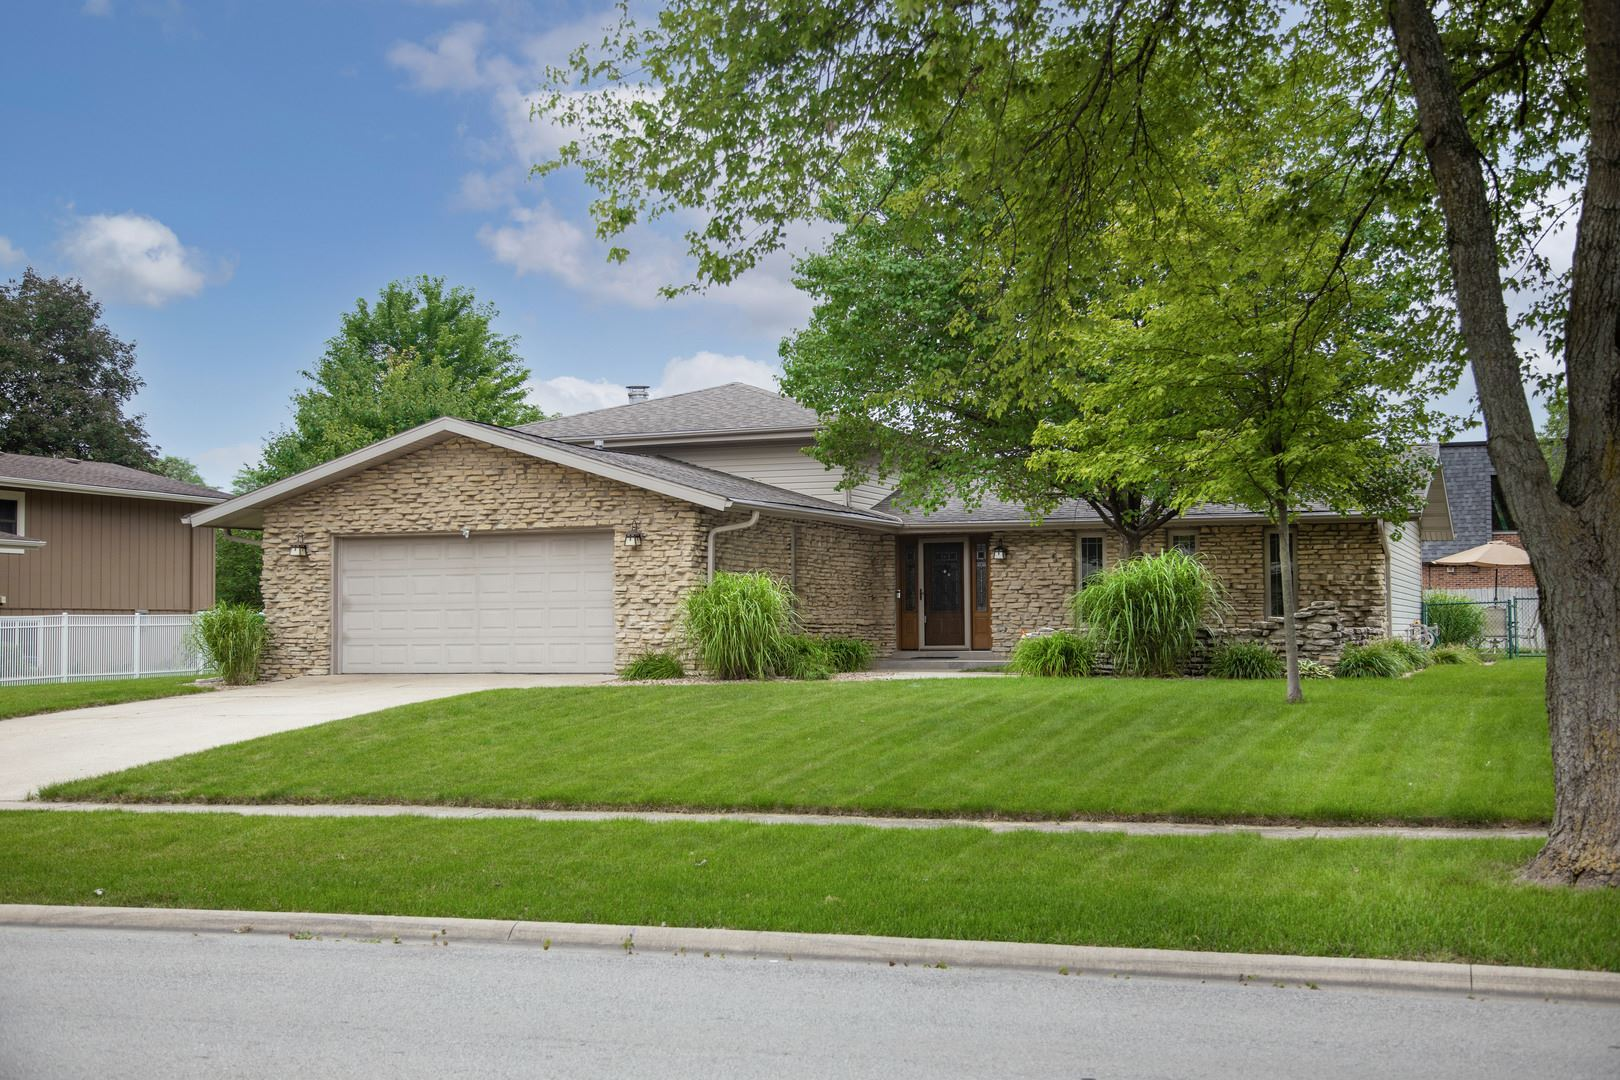 Photo of 202 N Brookshore Drive, Shorewood, IL 60404 (MLS # 11157853)